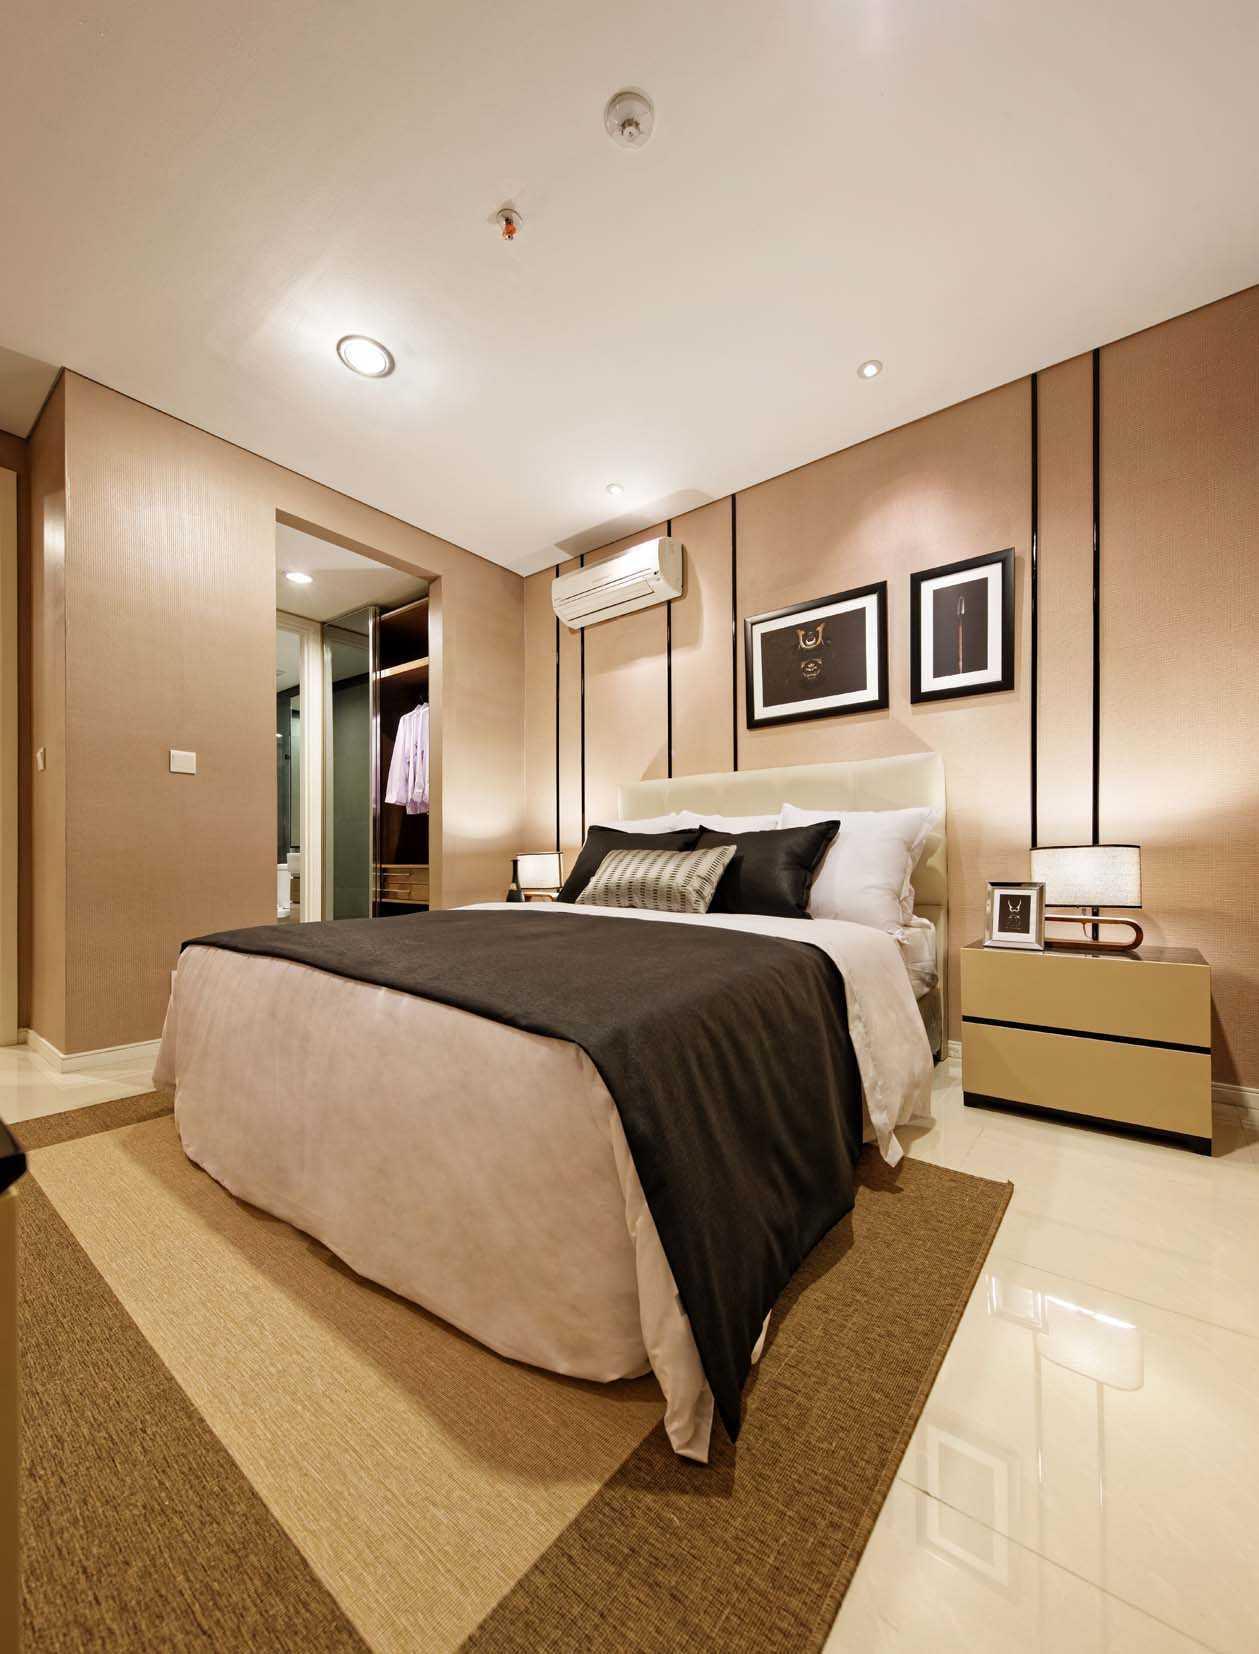 Teddykoo  3 Bedroom Loft Show Unit Paddington Height Apartment Alam Sutera  Alam Sutera  Bedroom   9637